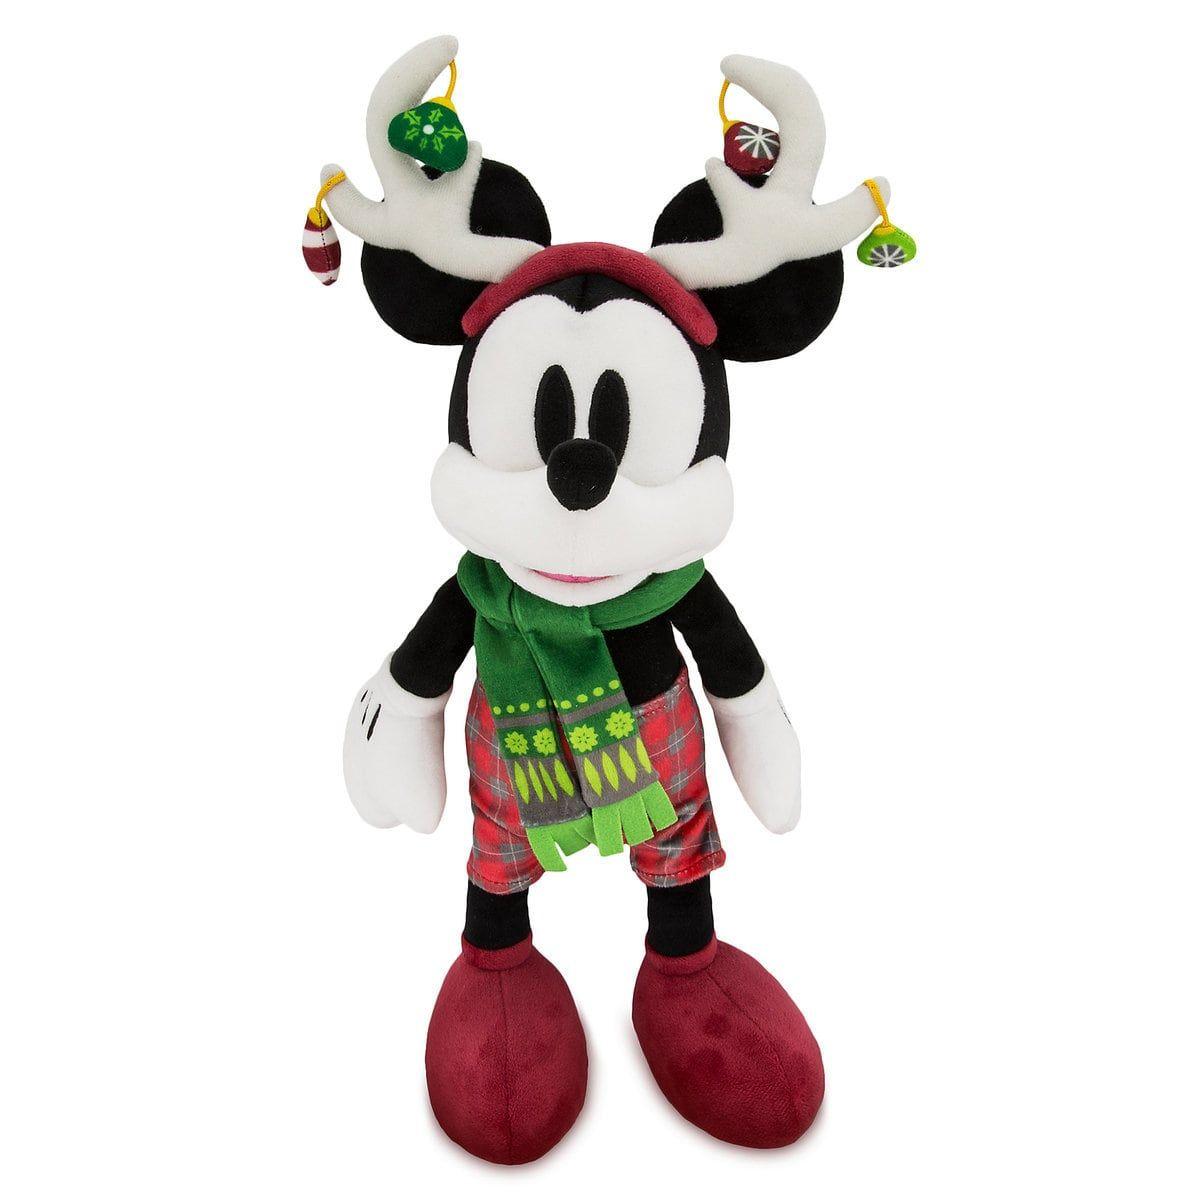 Disney Goofy Plush  Christmas 2018 Holidays Disney World Theme Parks NEW